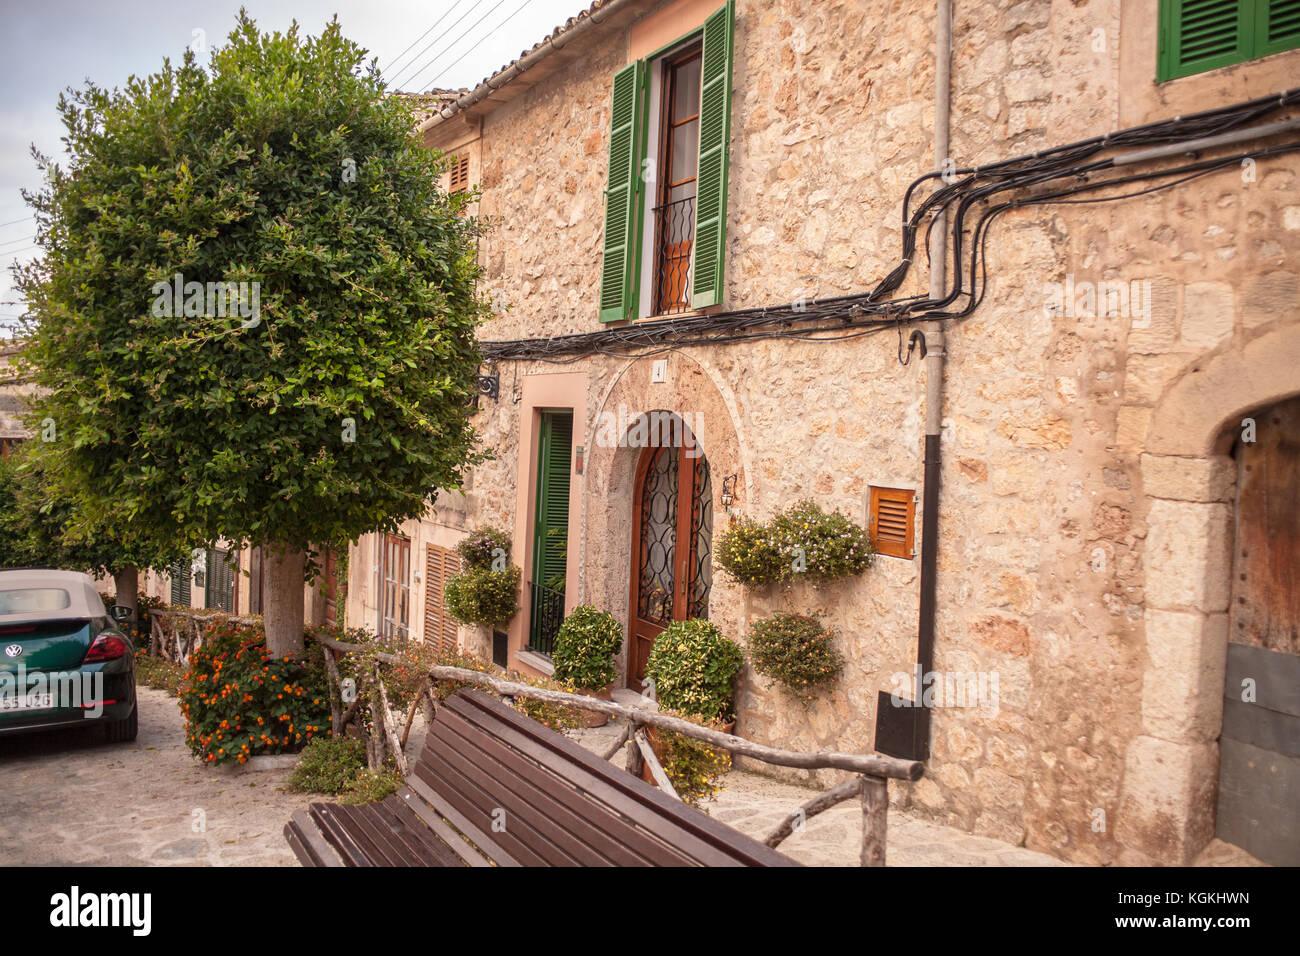 Gran árbol junto a la casa en la calle en Valldemossa, Mallorca Imagen De Stock